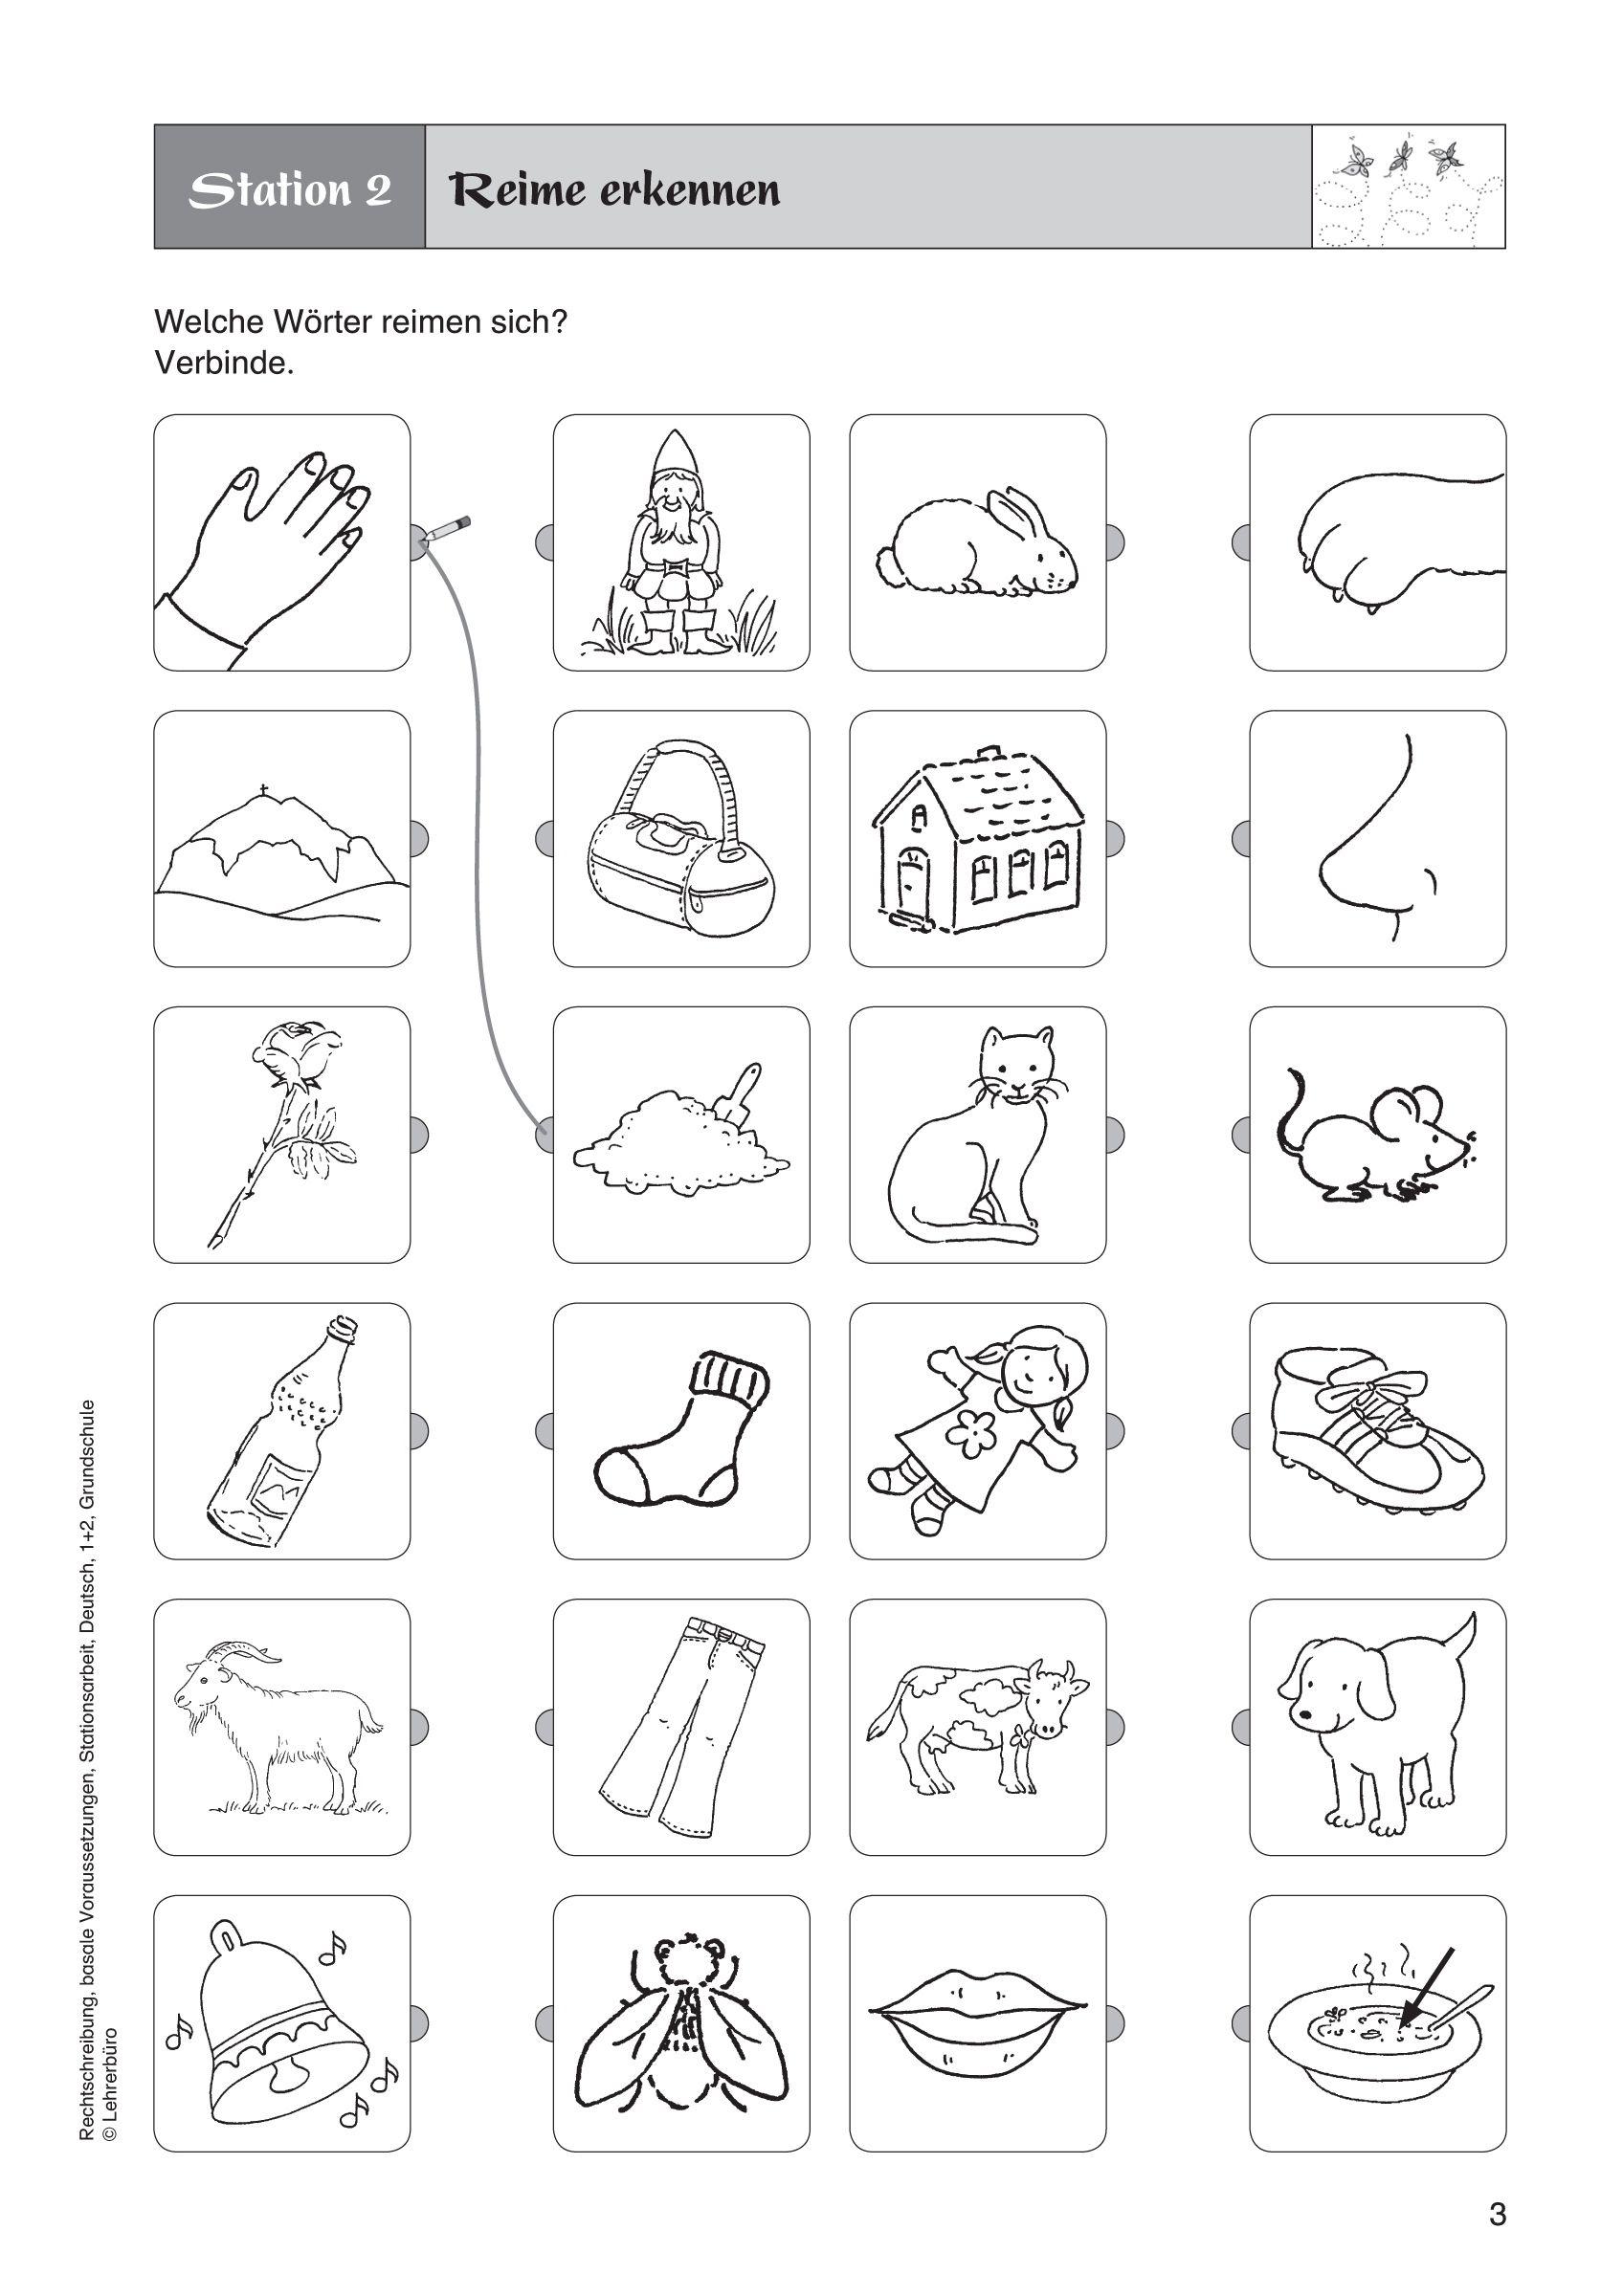 Arbeitsblatter Grundschule 1 Klasse Ausdrucken 1 Klasse